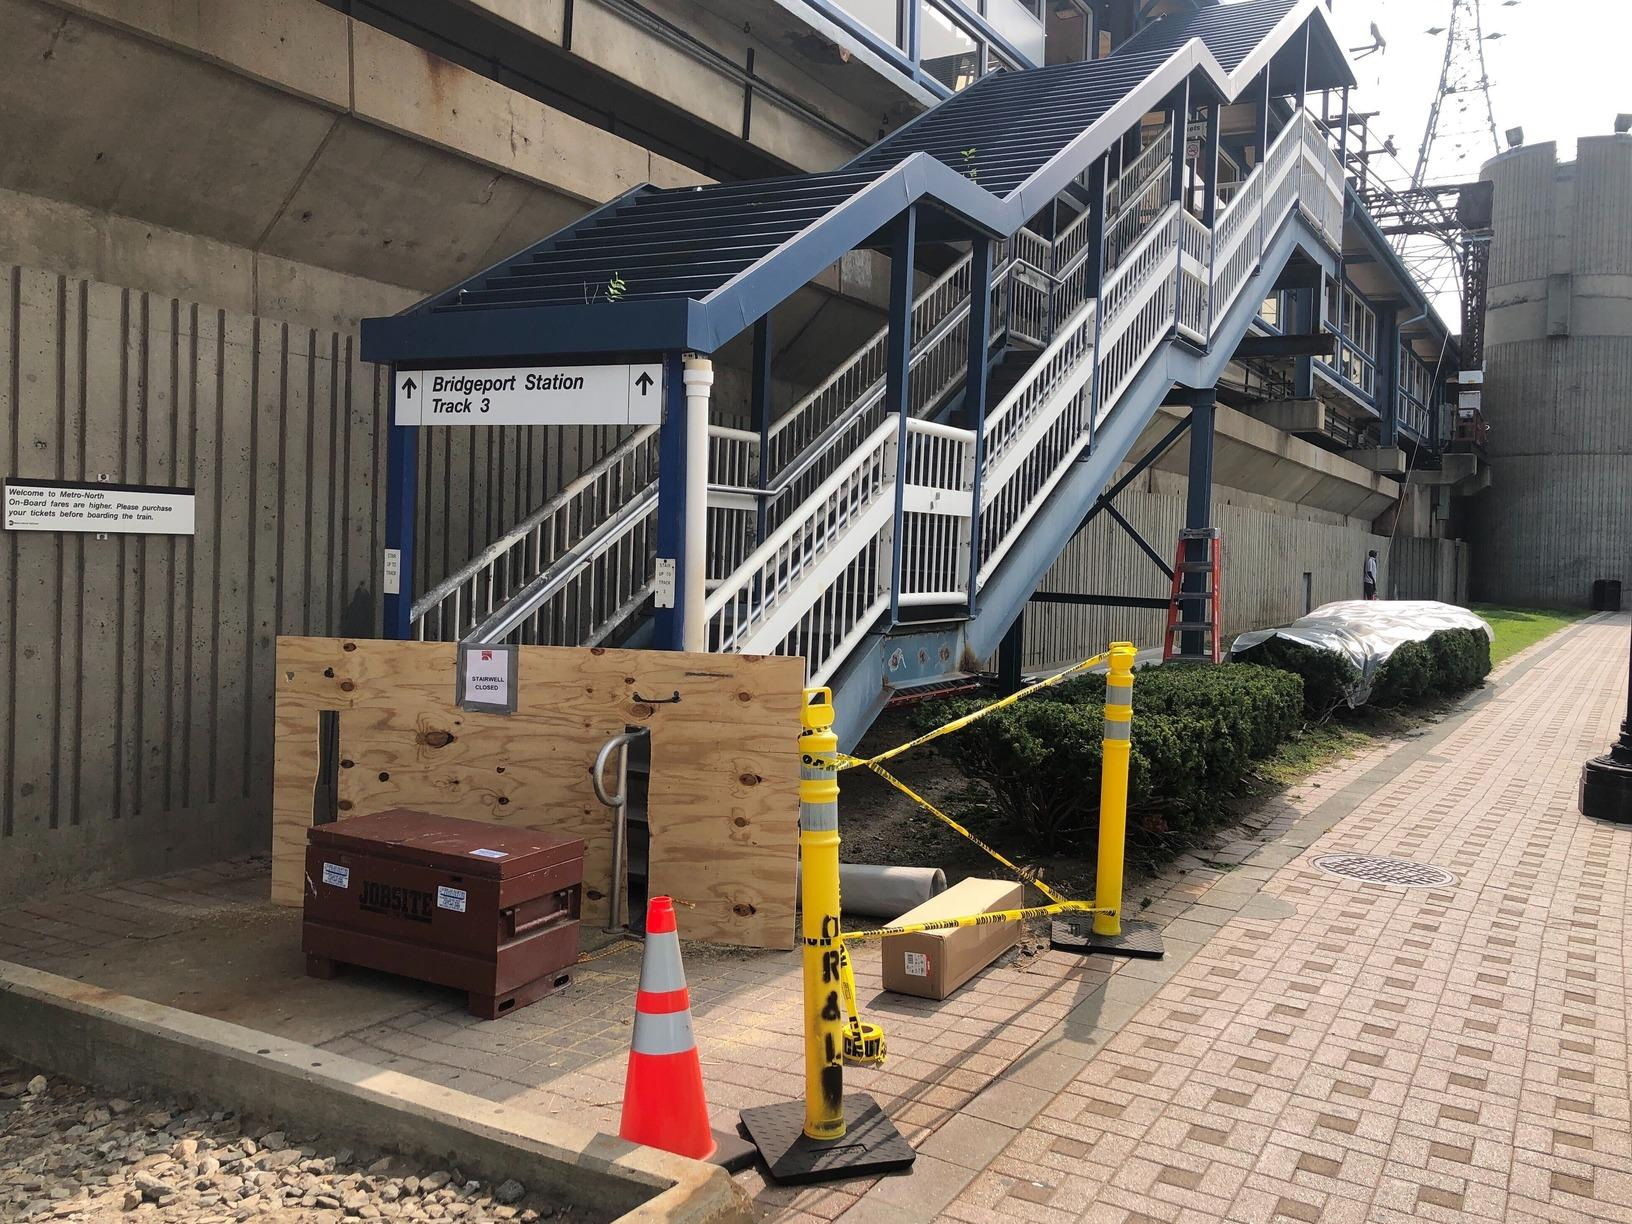 Bridgeport Train Station Stairwell - Before Photo